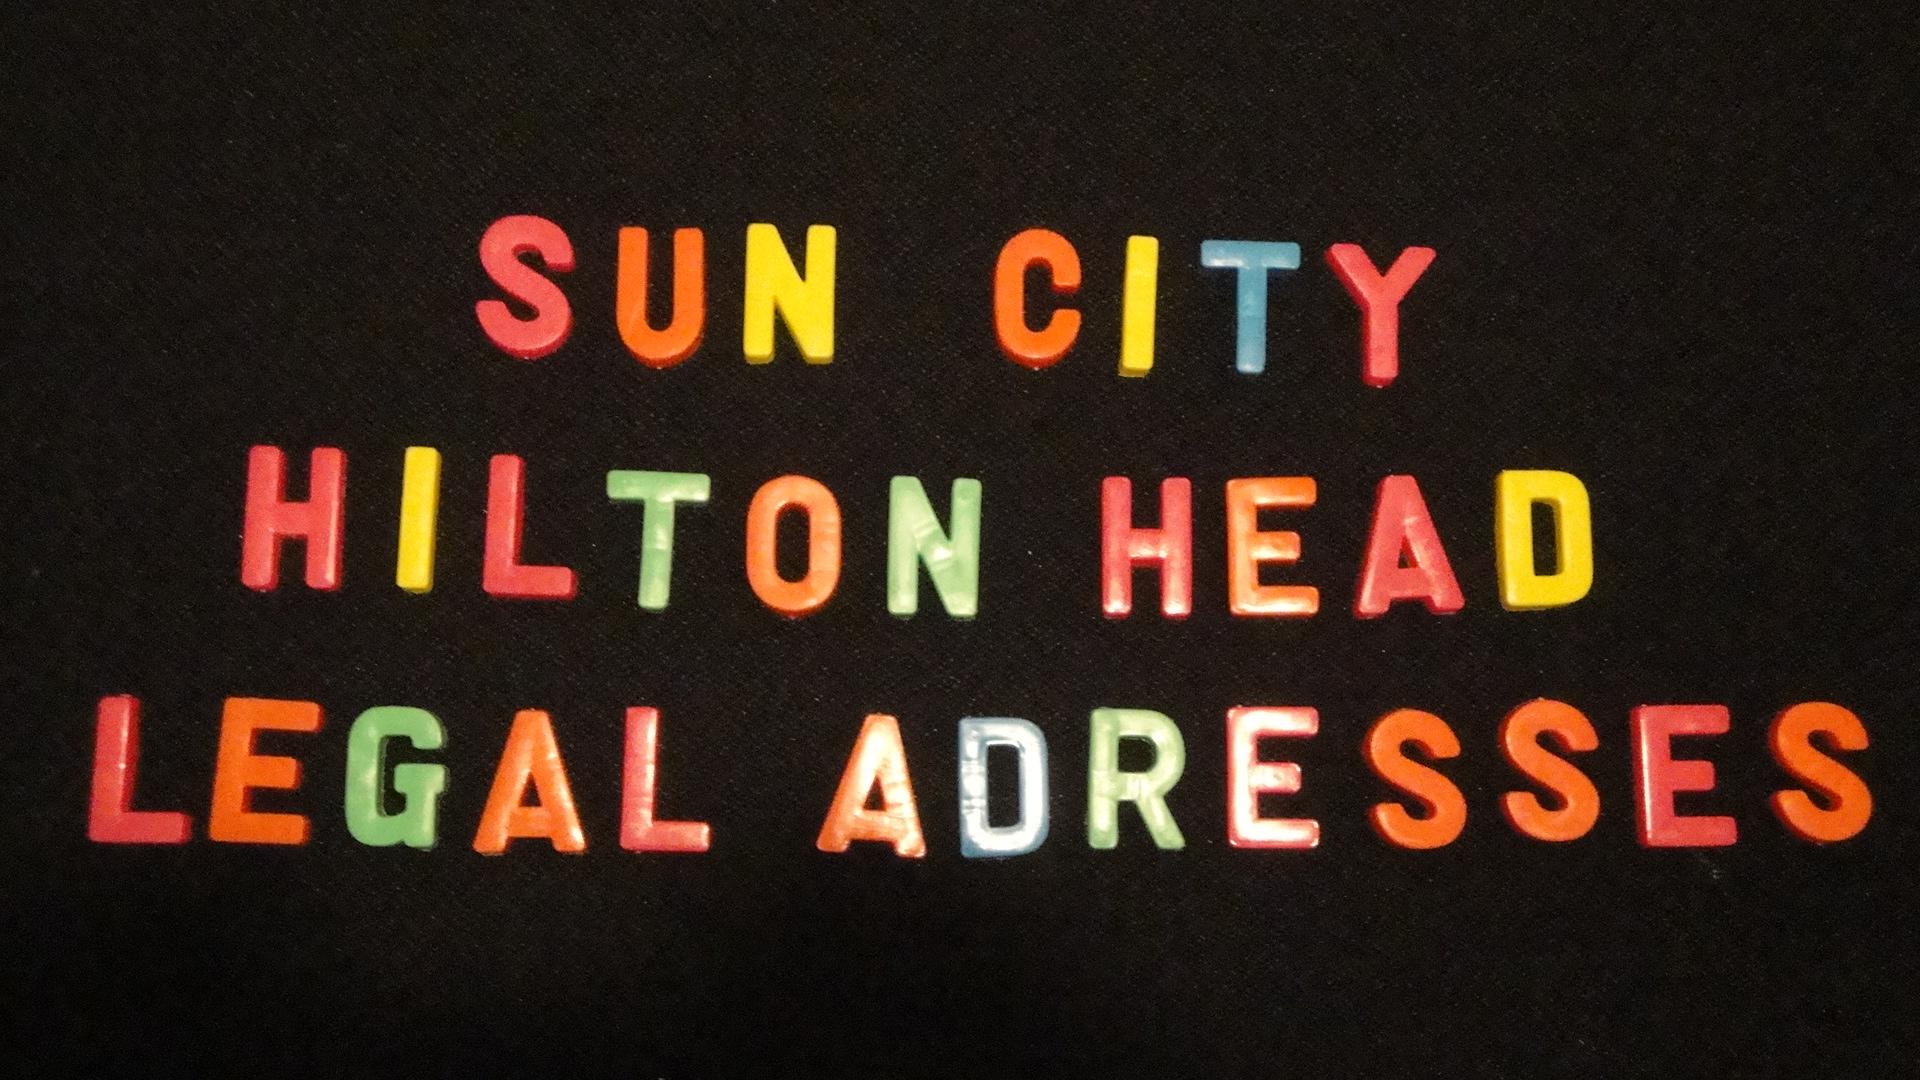 sun city hilton head legal addresses, real estate, homes